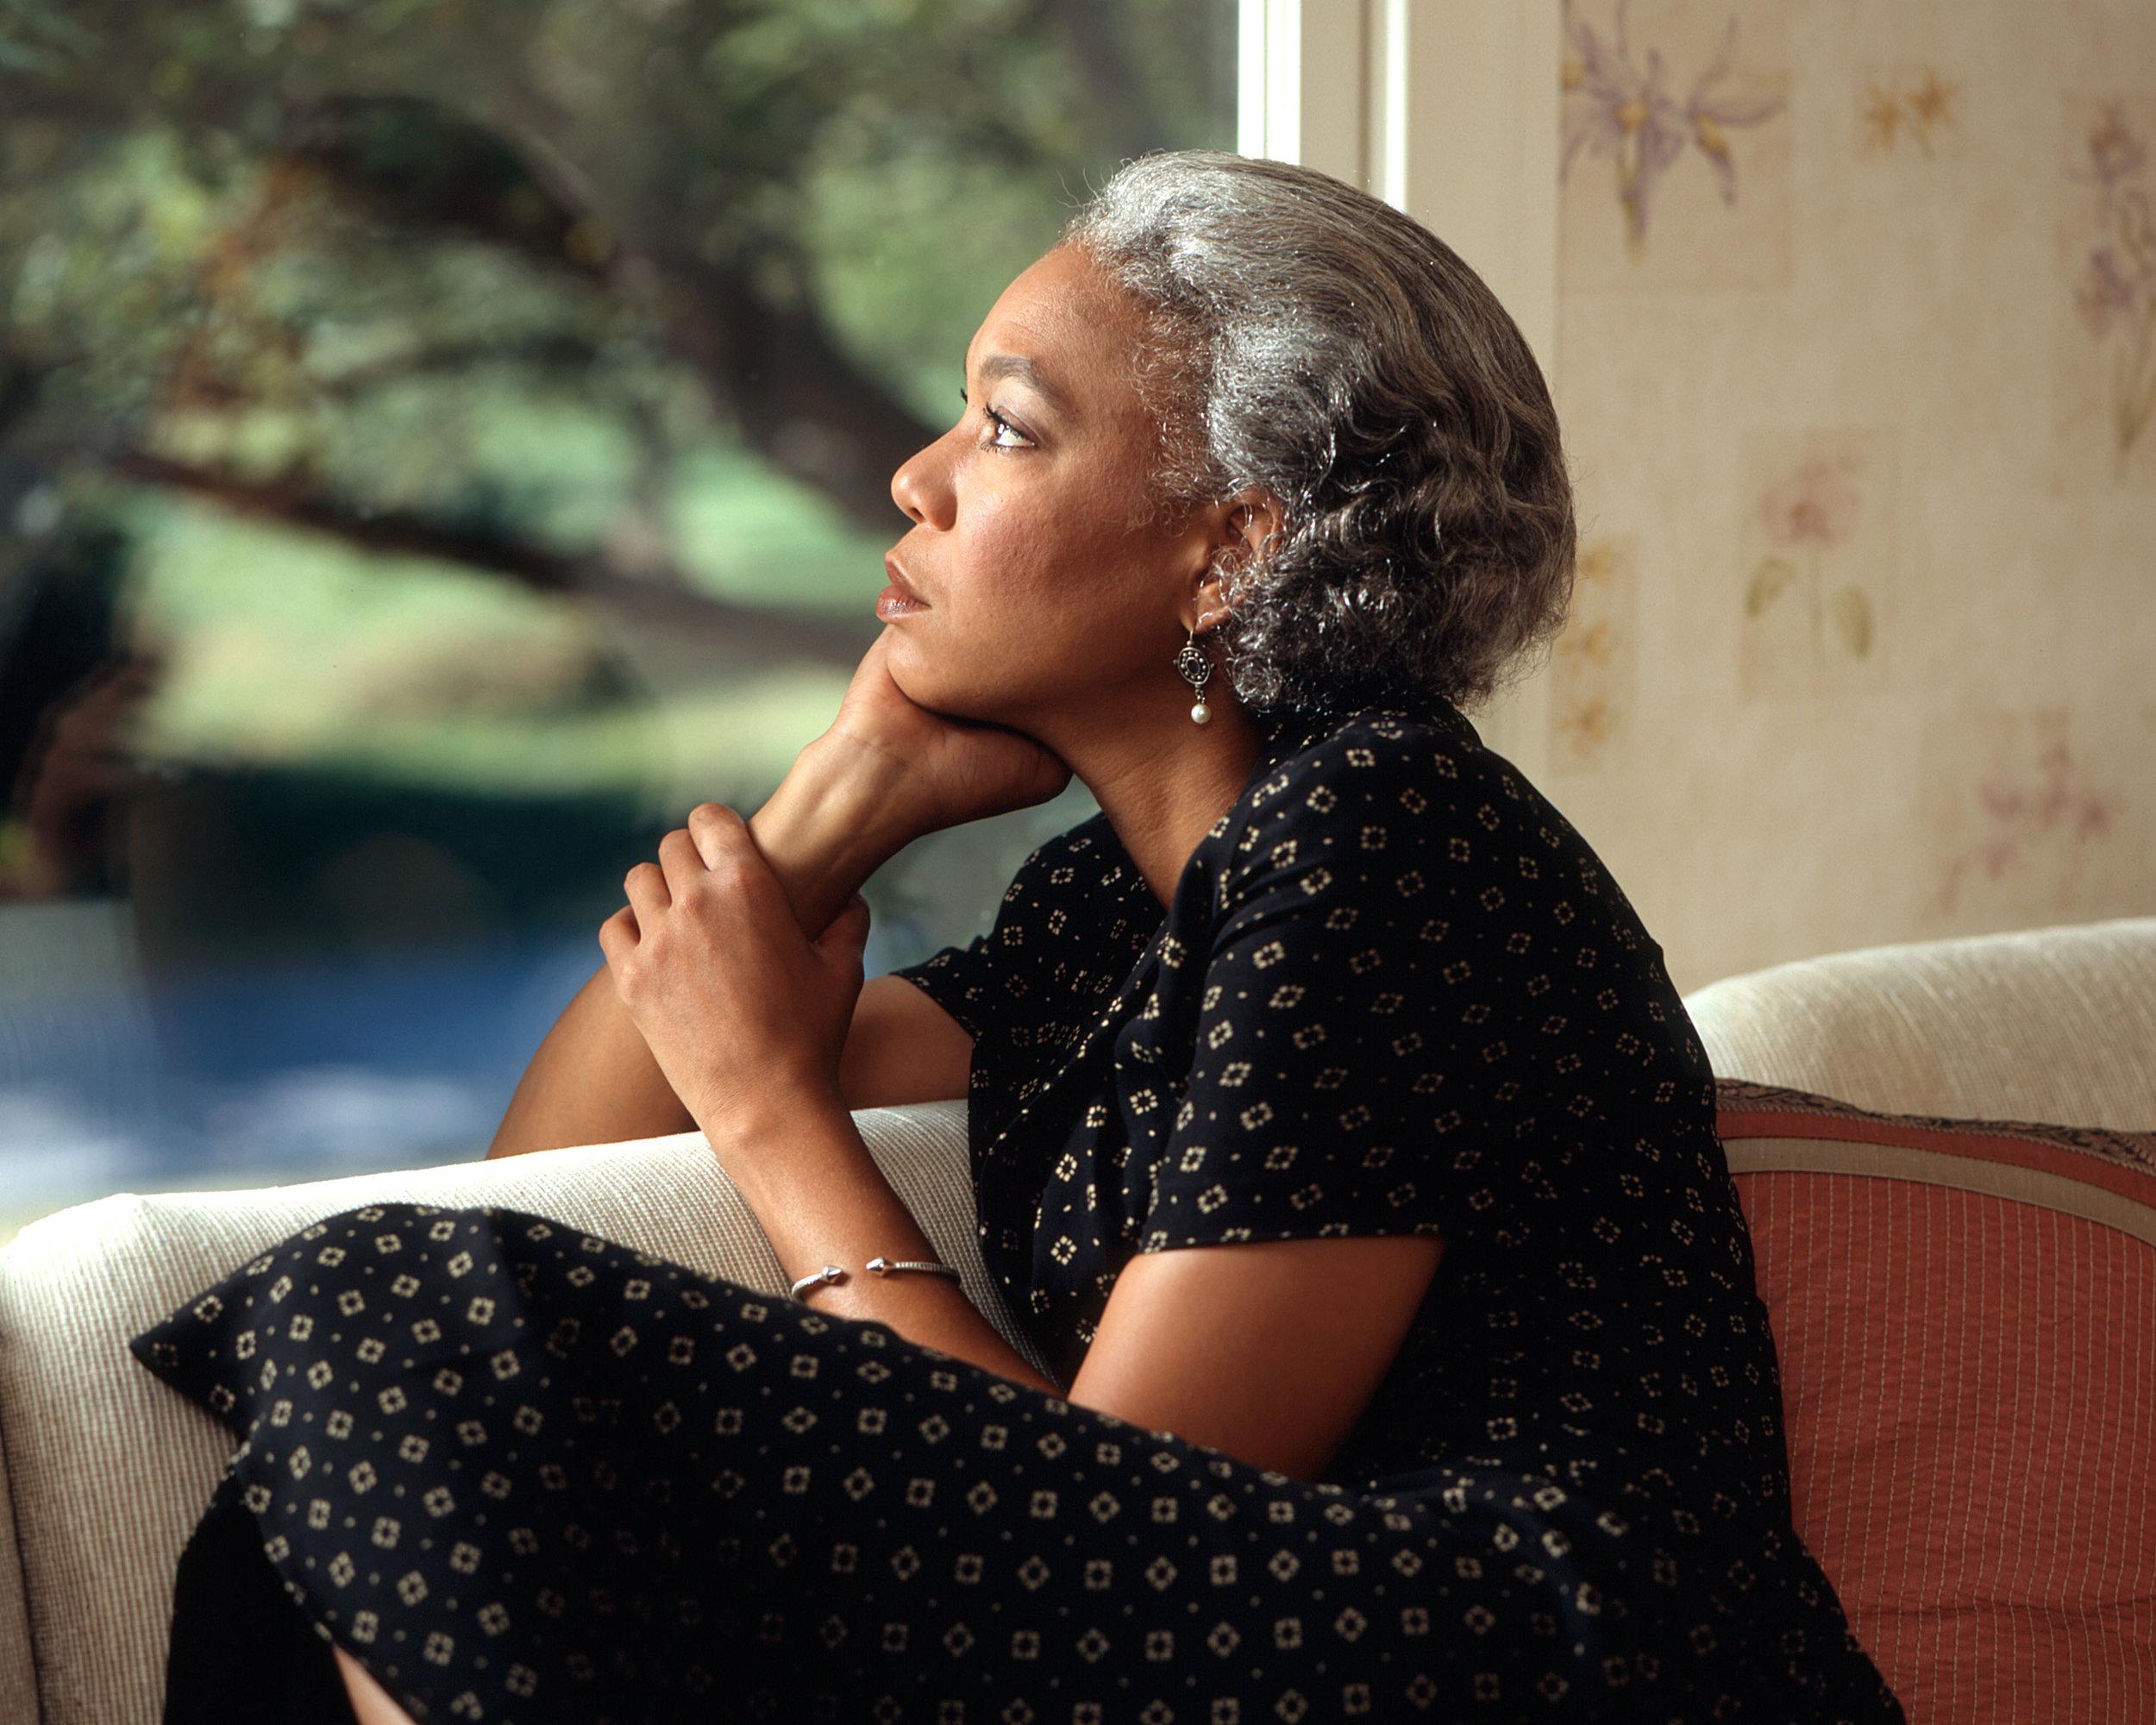 women thinking menopause brain fog memory loss.jpg